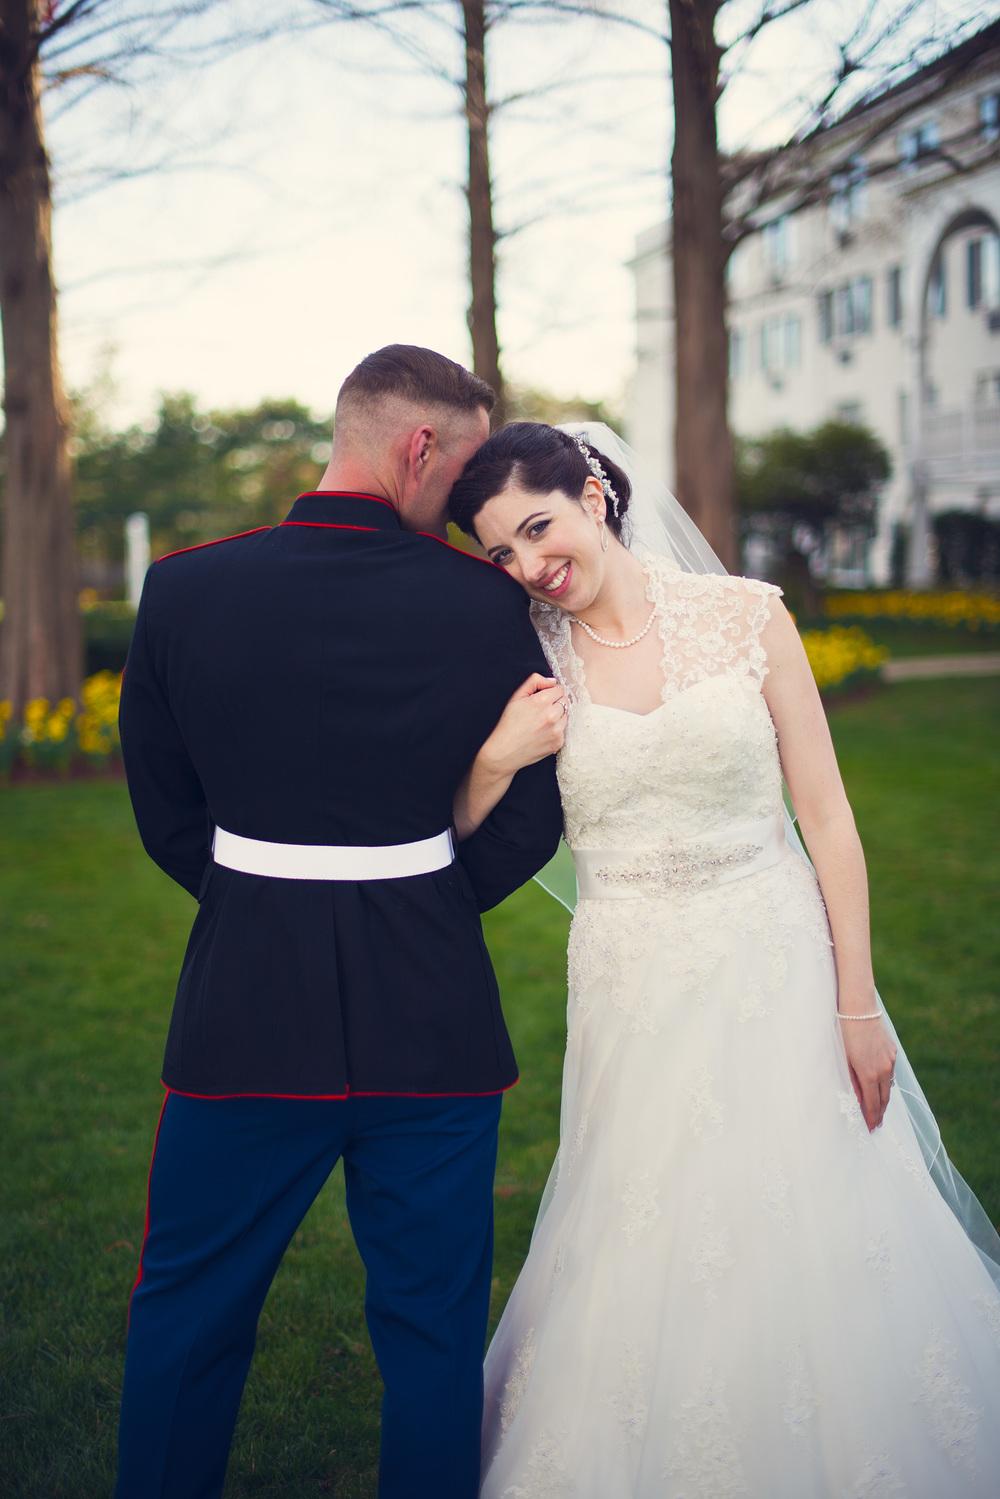 bride groom marine smile outdoor love husband wife portrait THPHOTO